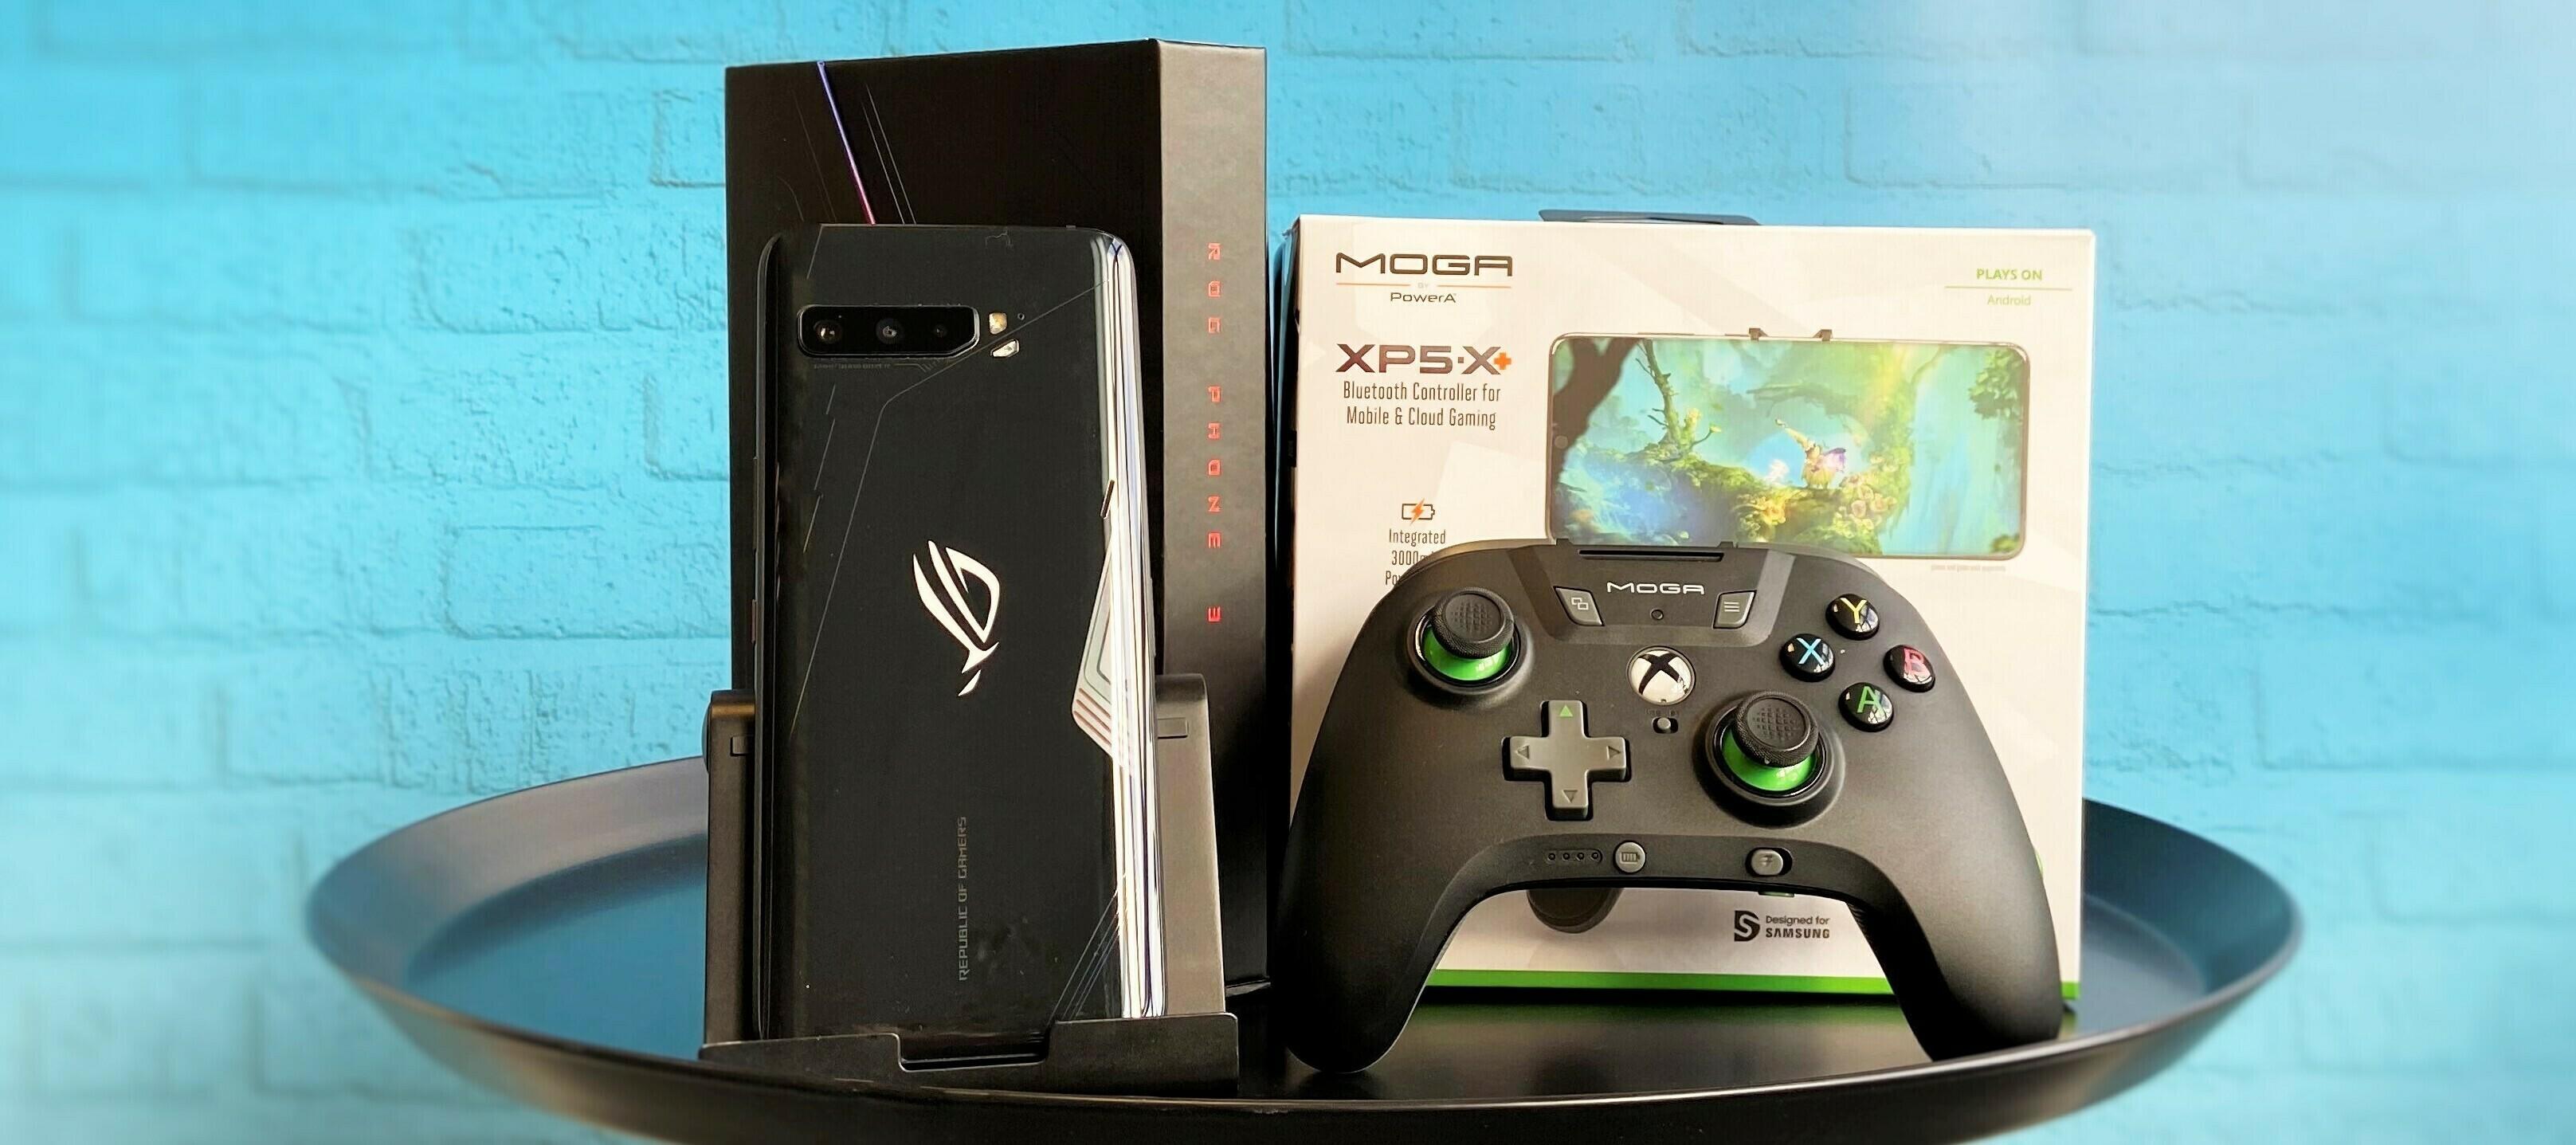 Asus Rog Phone 3 inkl. Moga XP5-X+ Bluetooth Controller - ein Bundle zum Zocken!